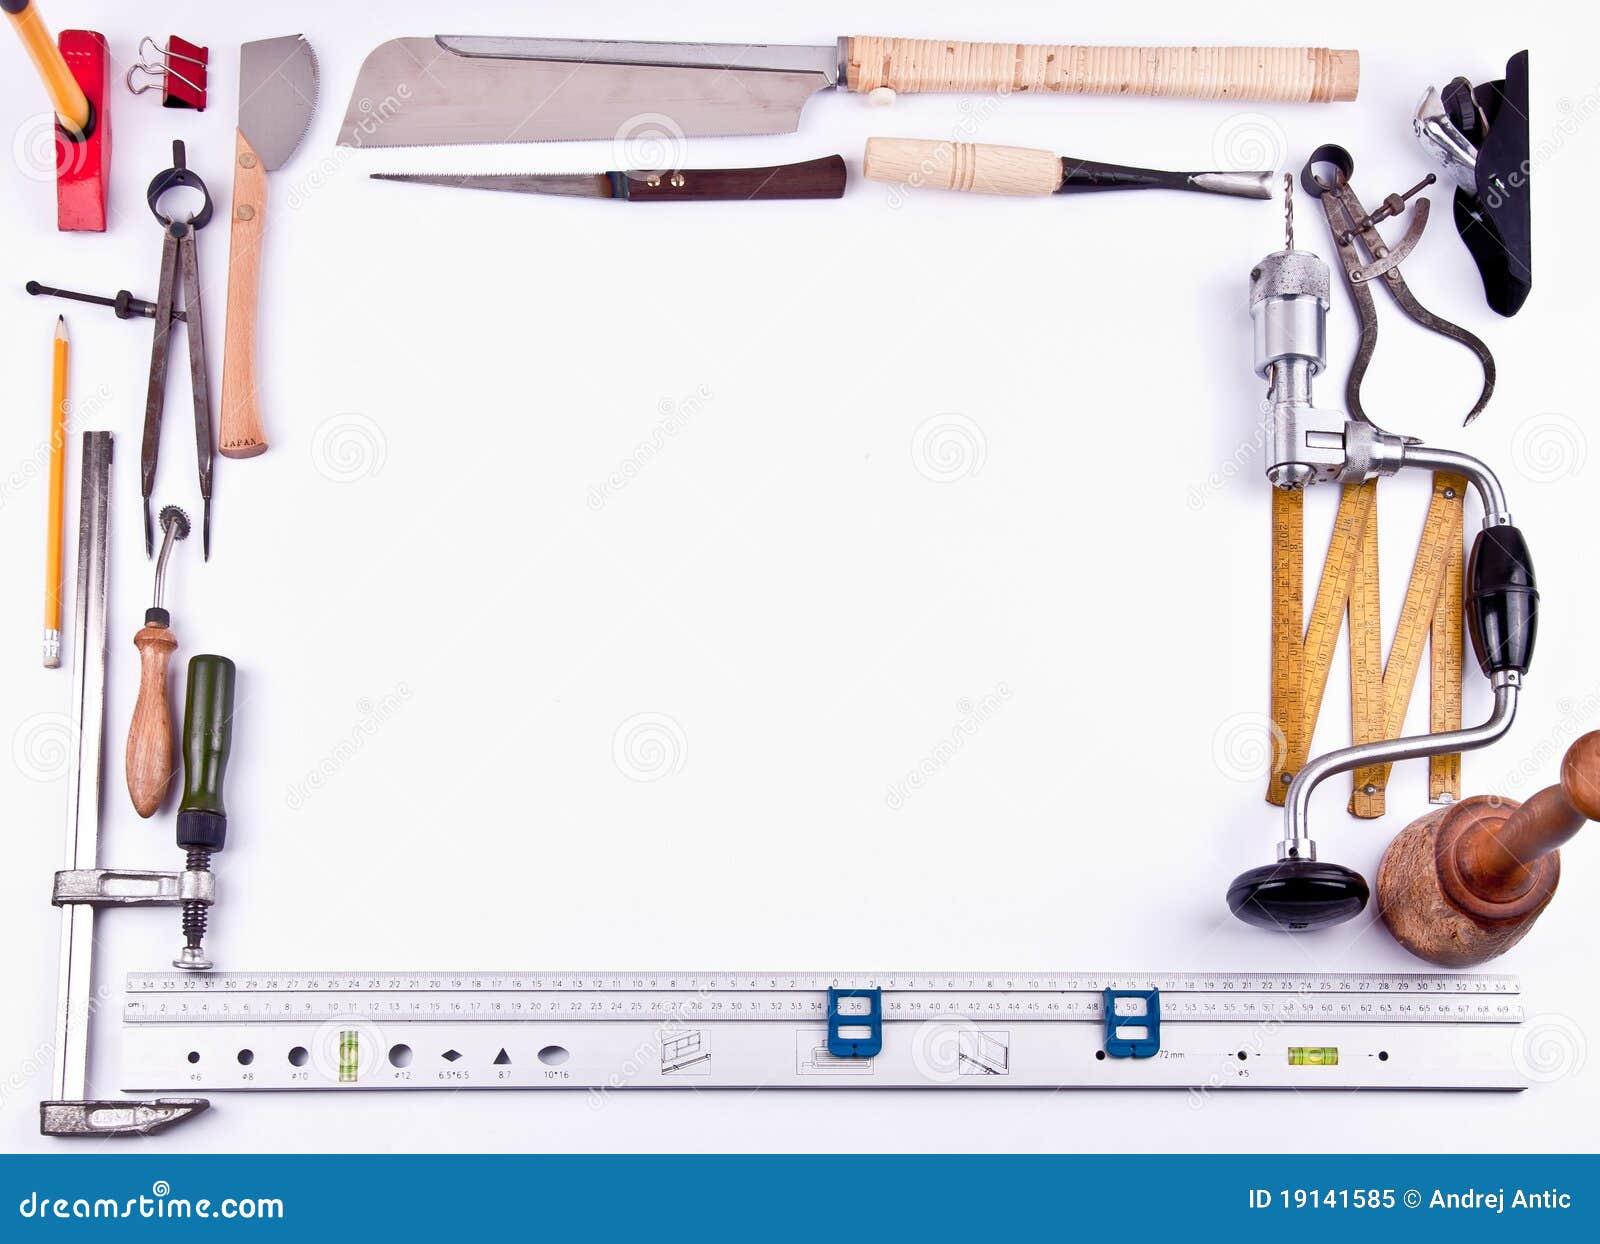 tool frame